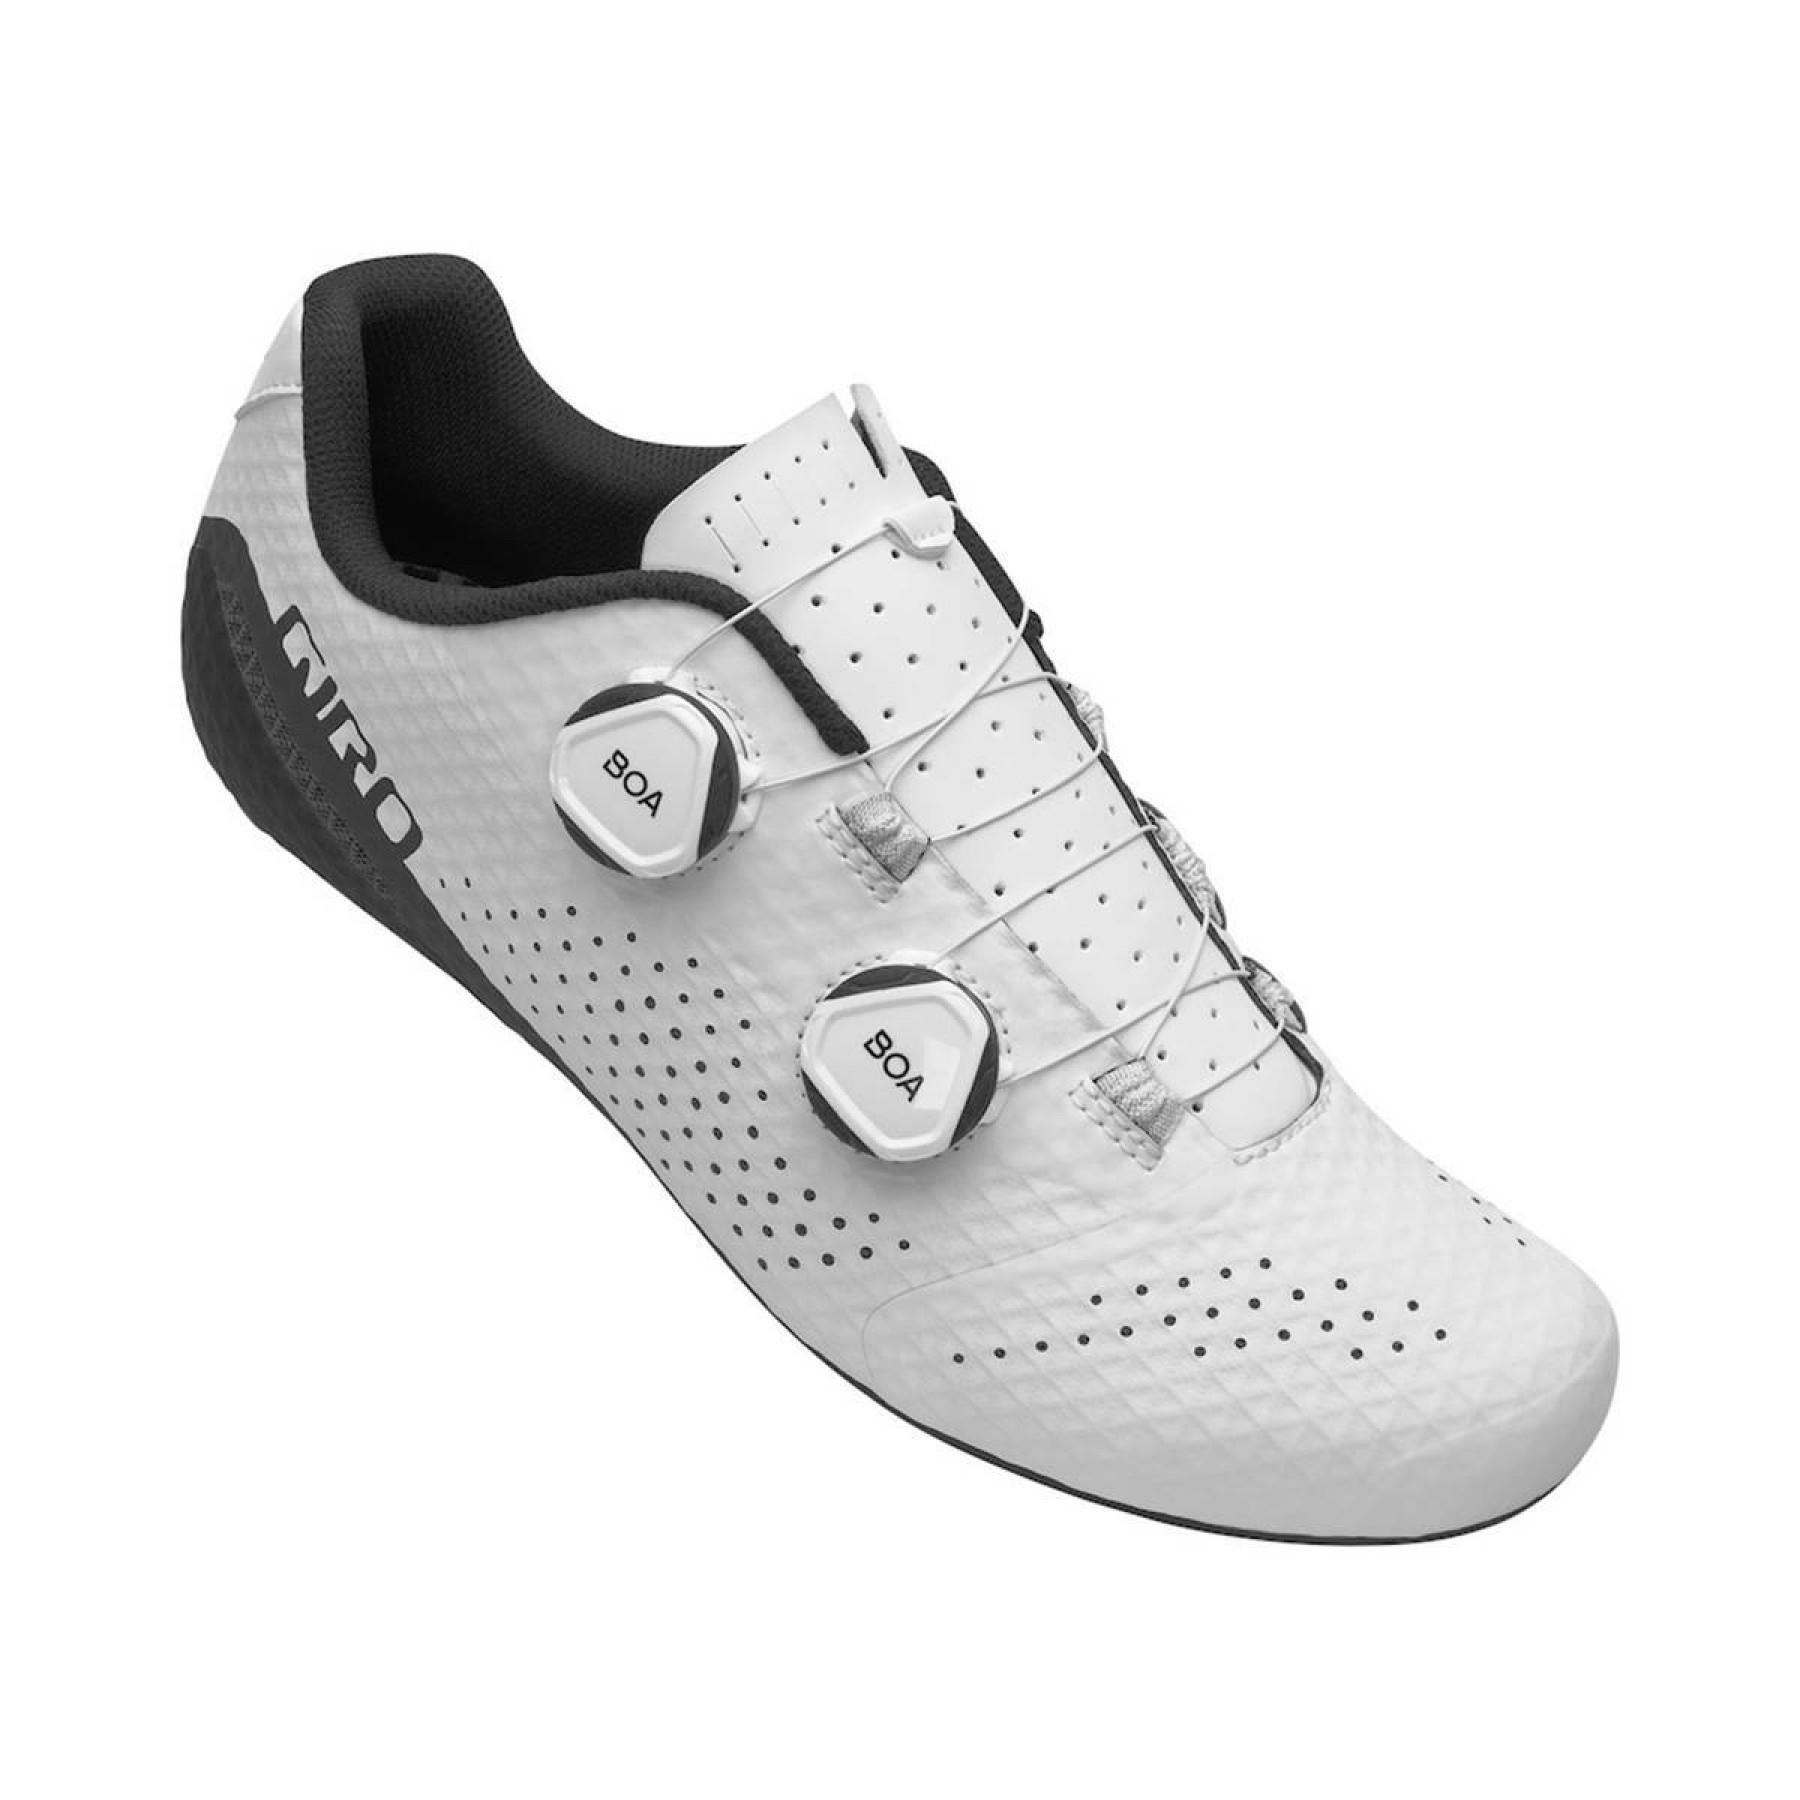 Giro Regime Schoenen